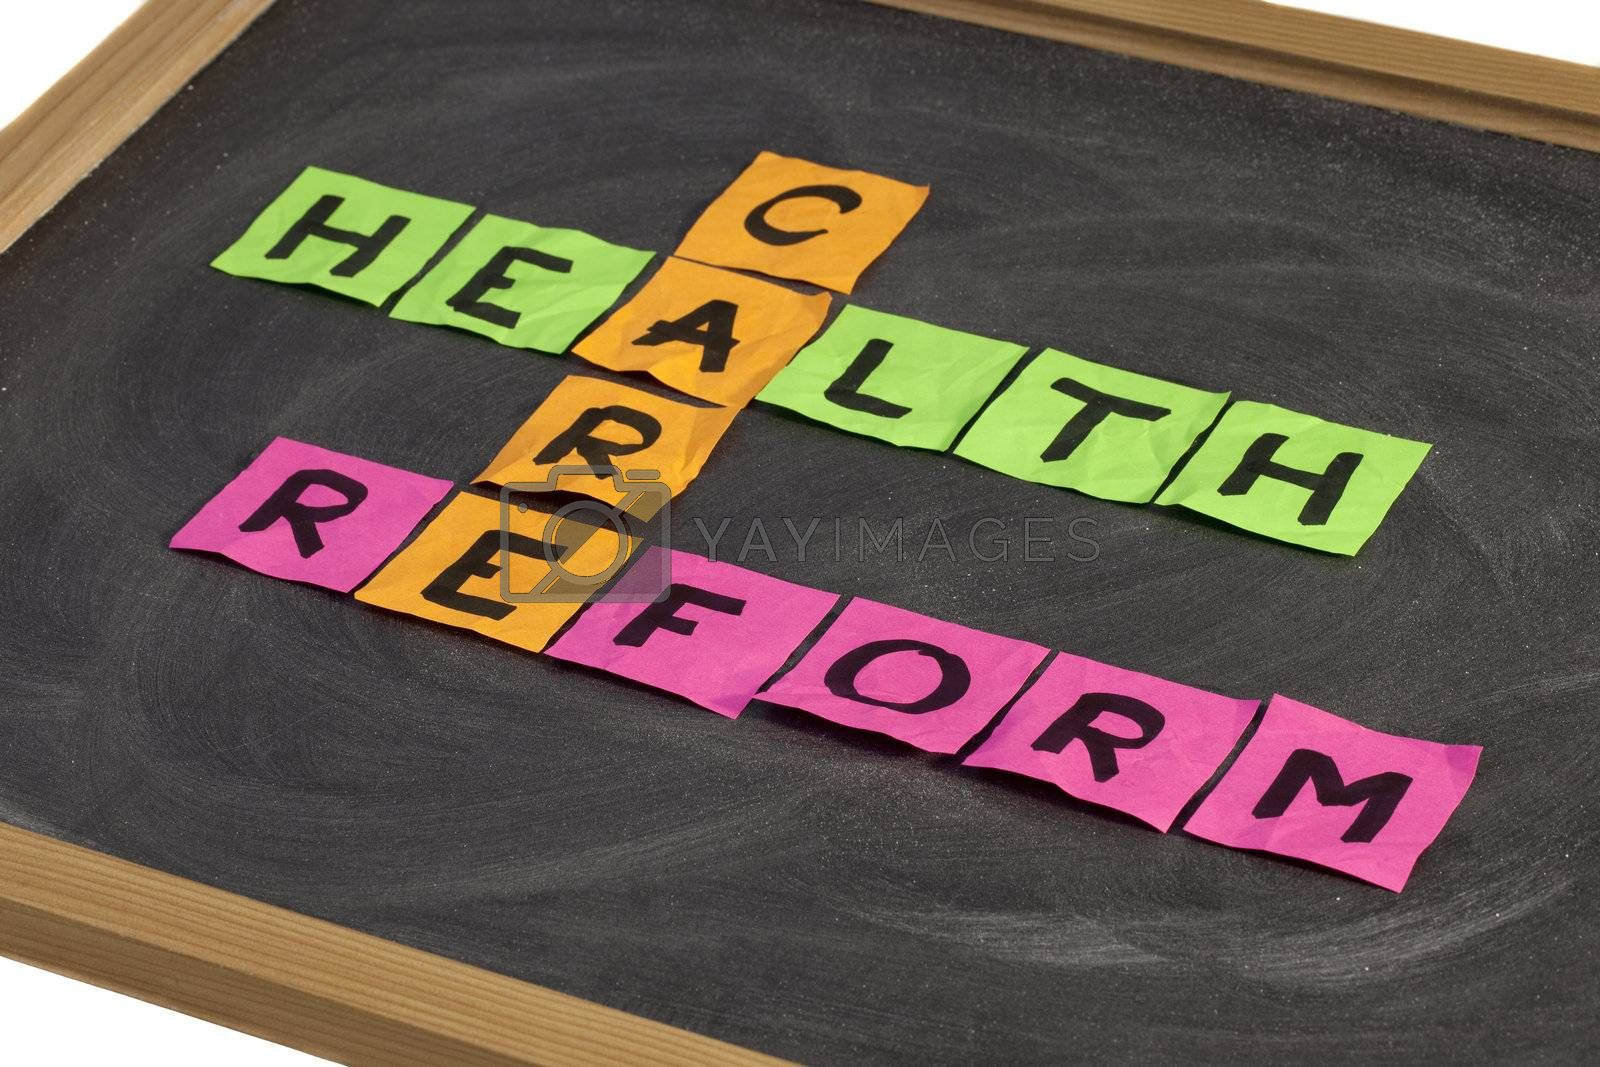 health care reform crossword by PixelsAway